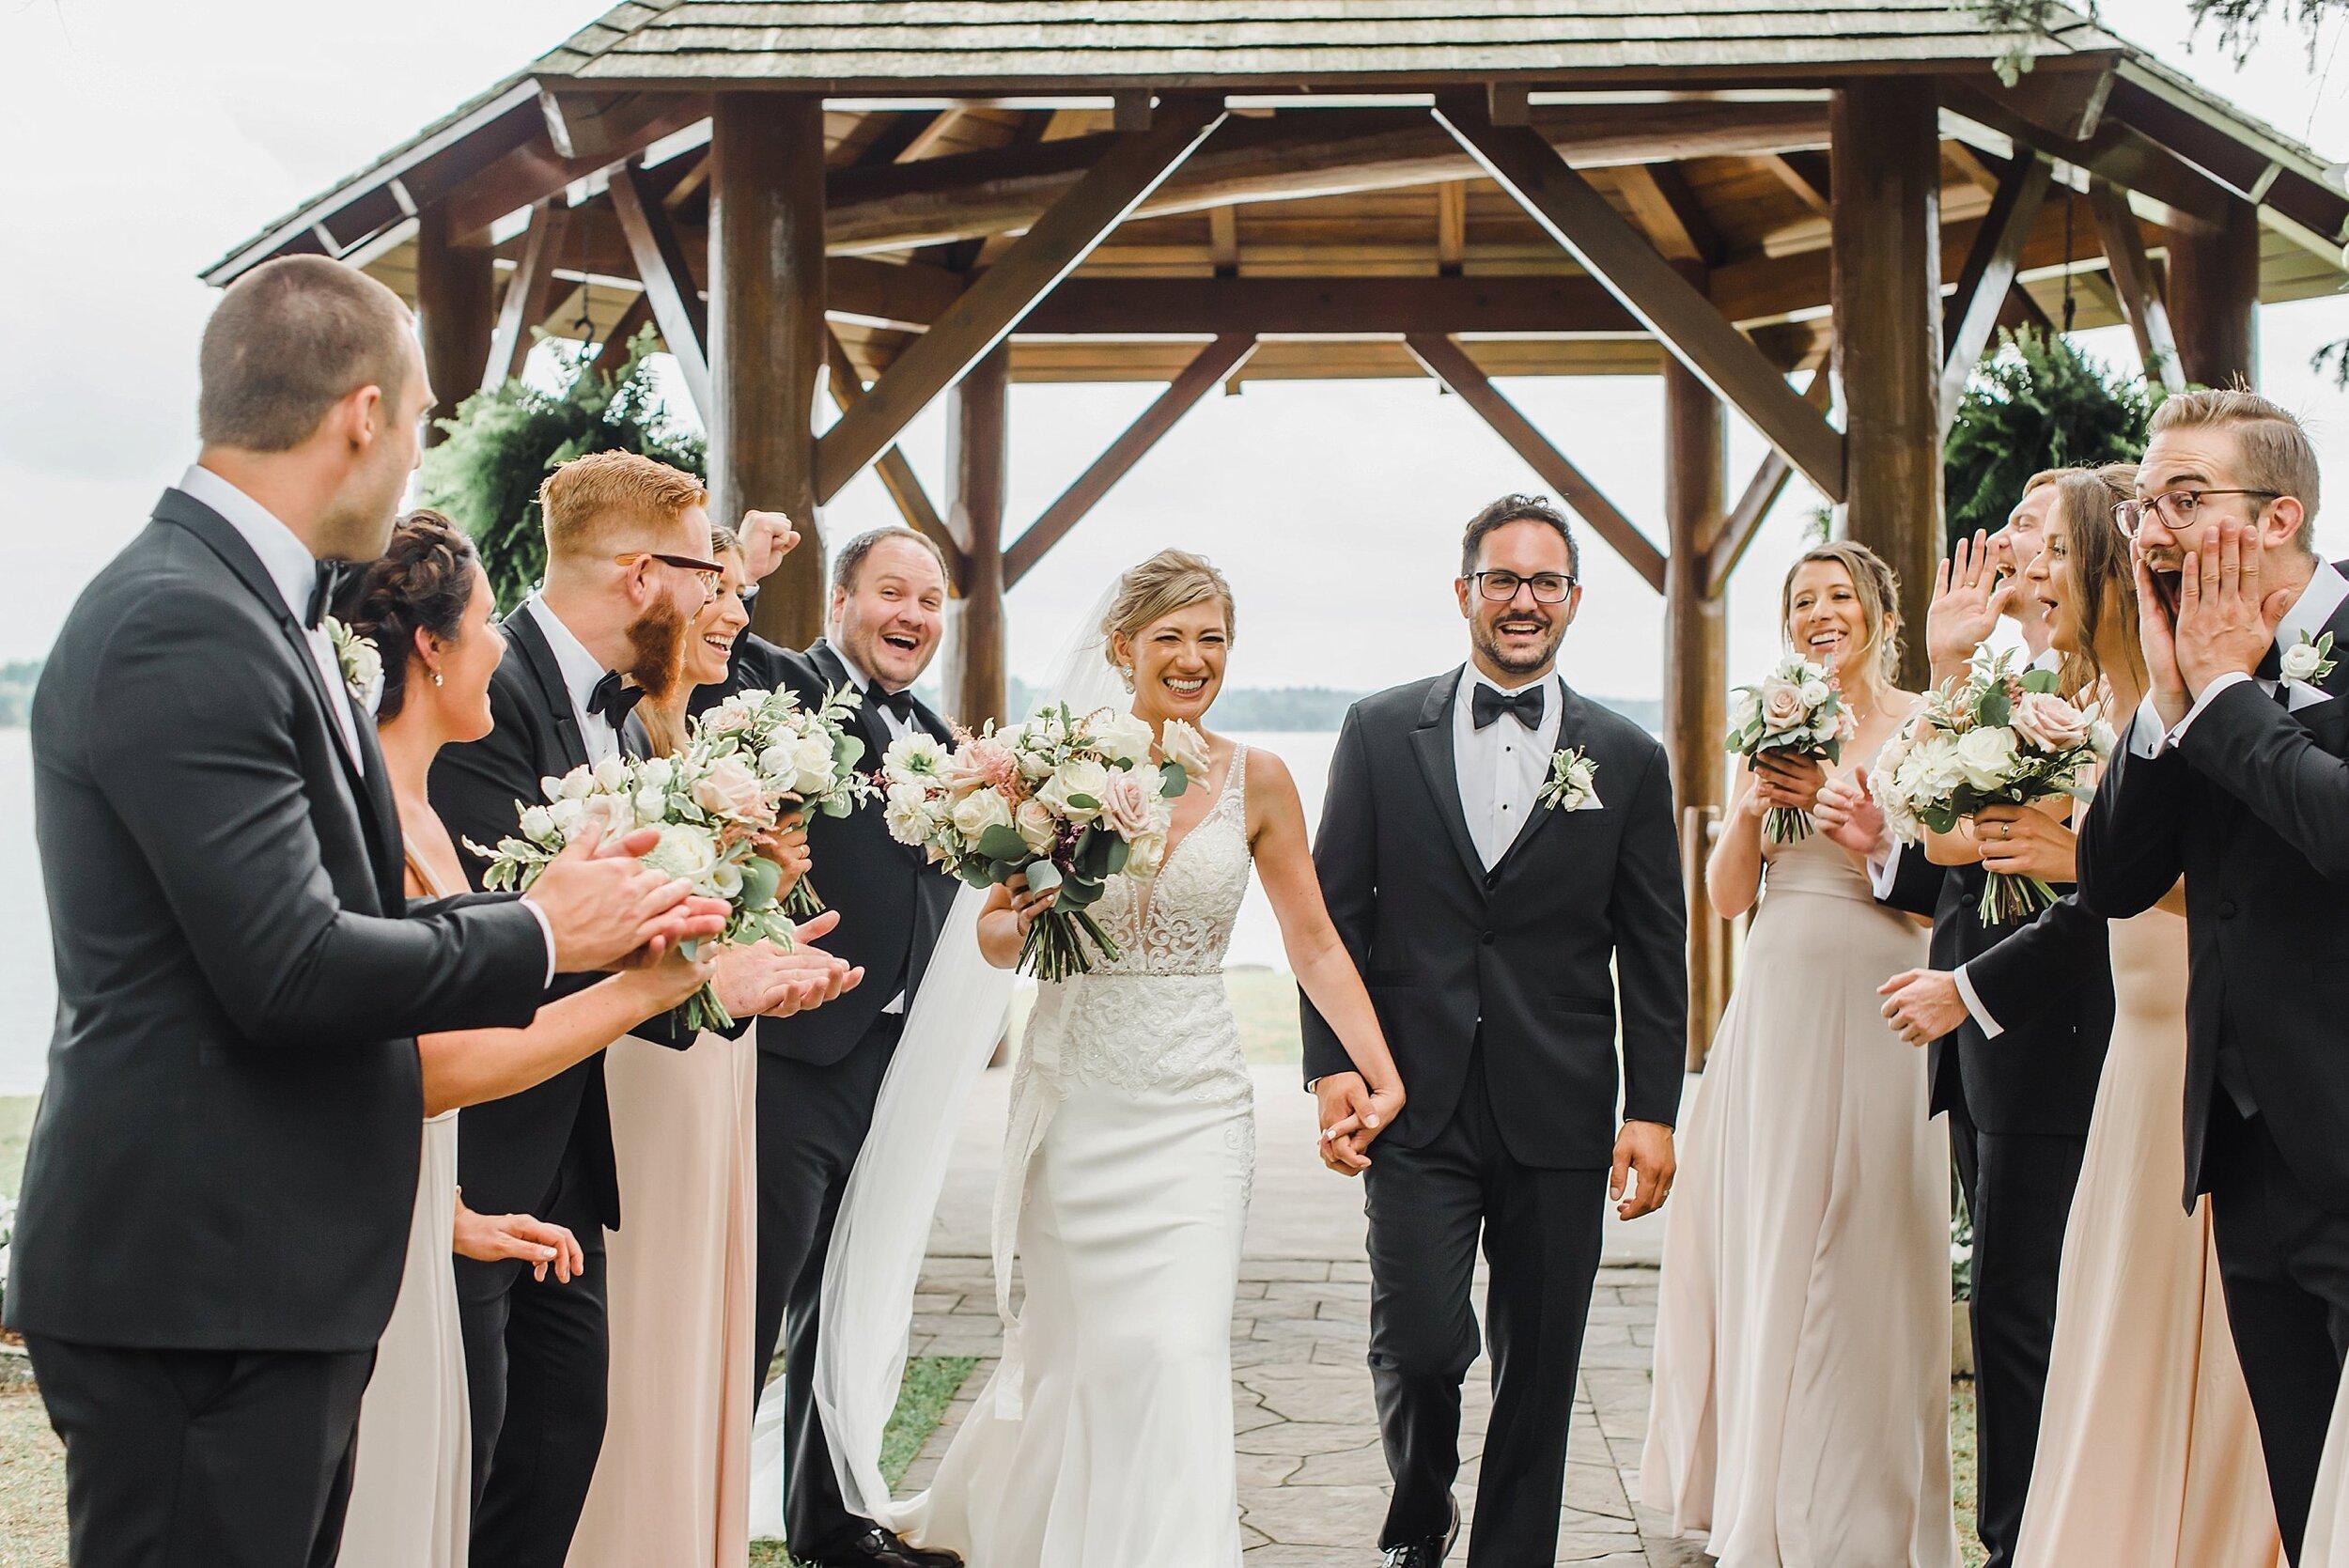 light airy fine art ottawa wedding photographer | Ali and Batoul Photography | Fairmont Le Chateau Montebello44.jpg